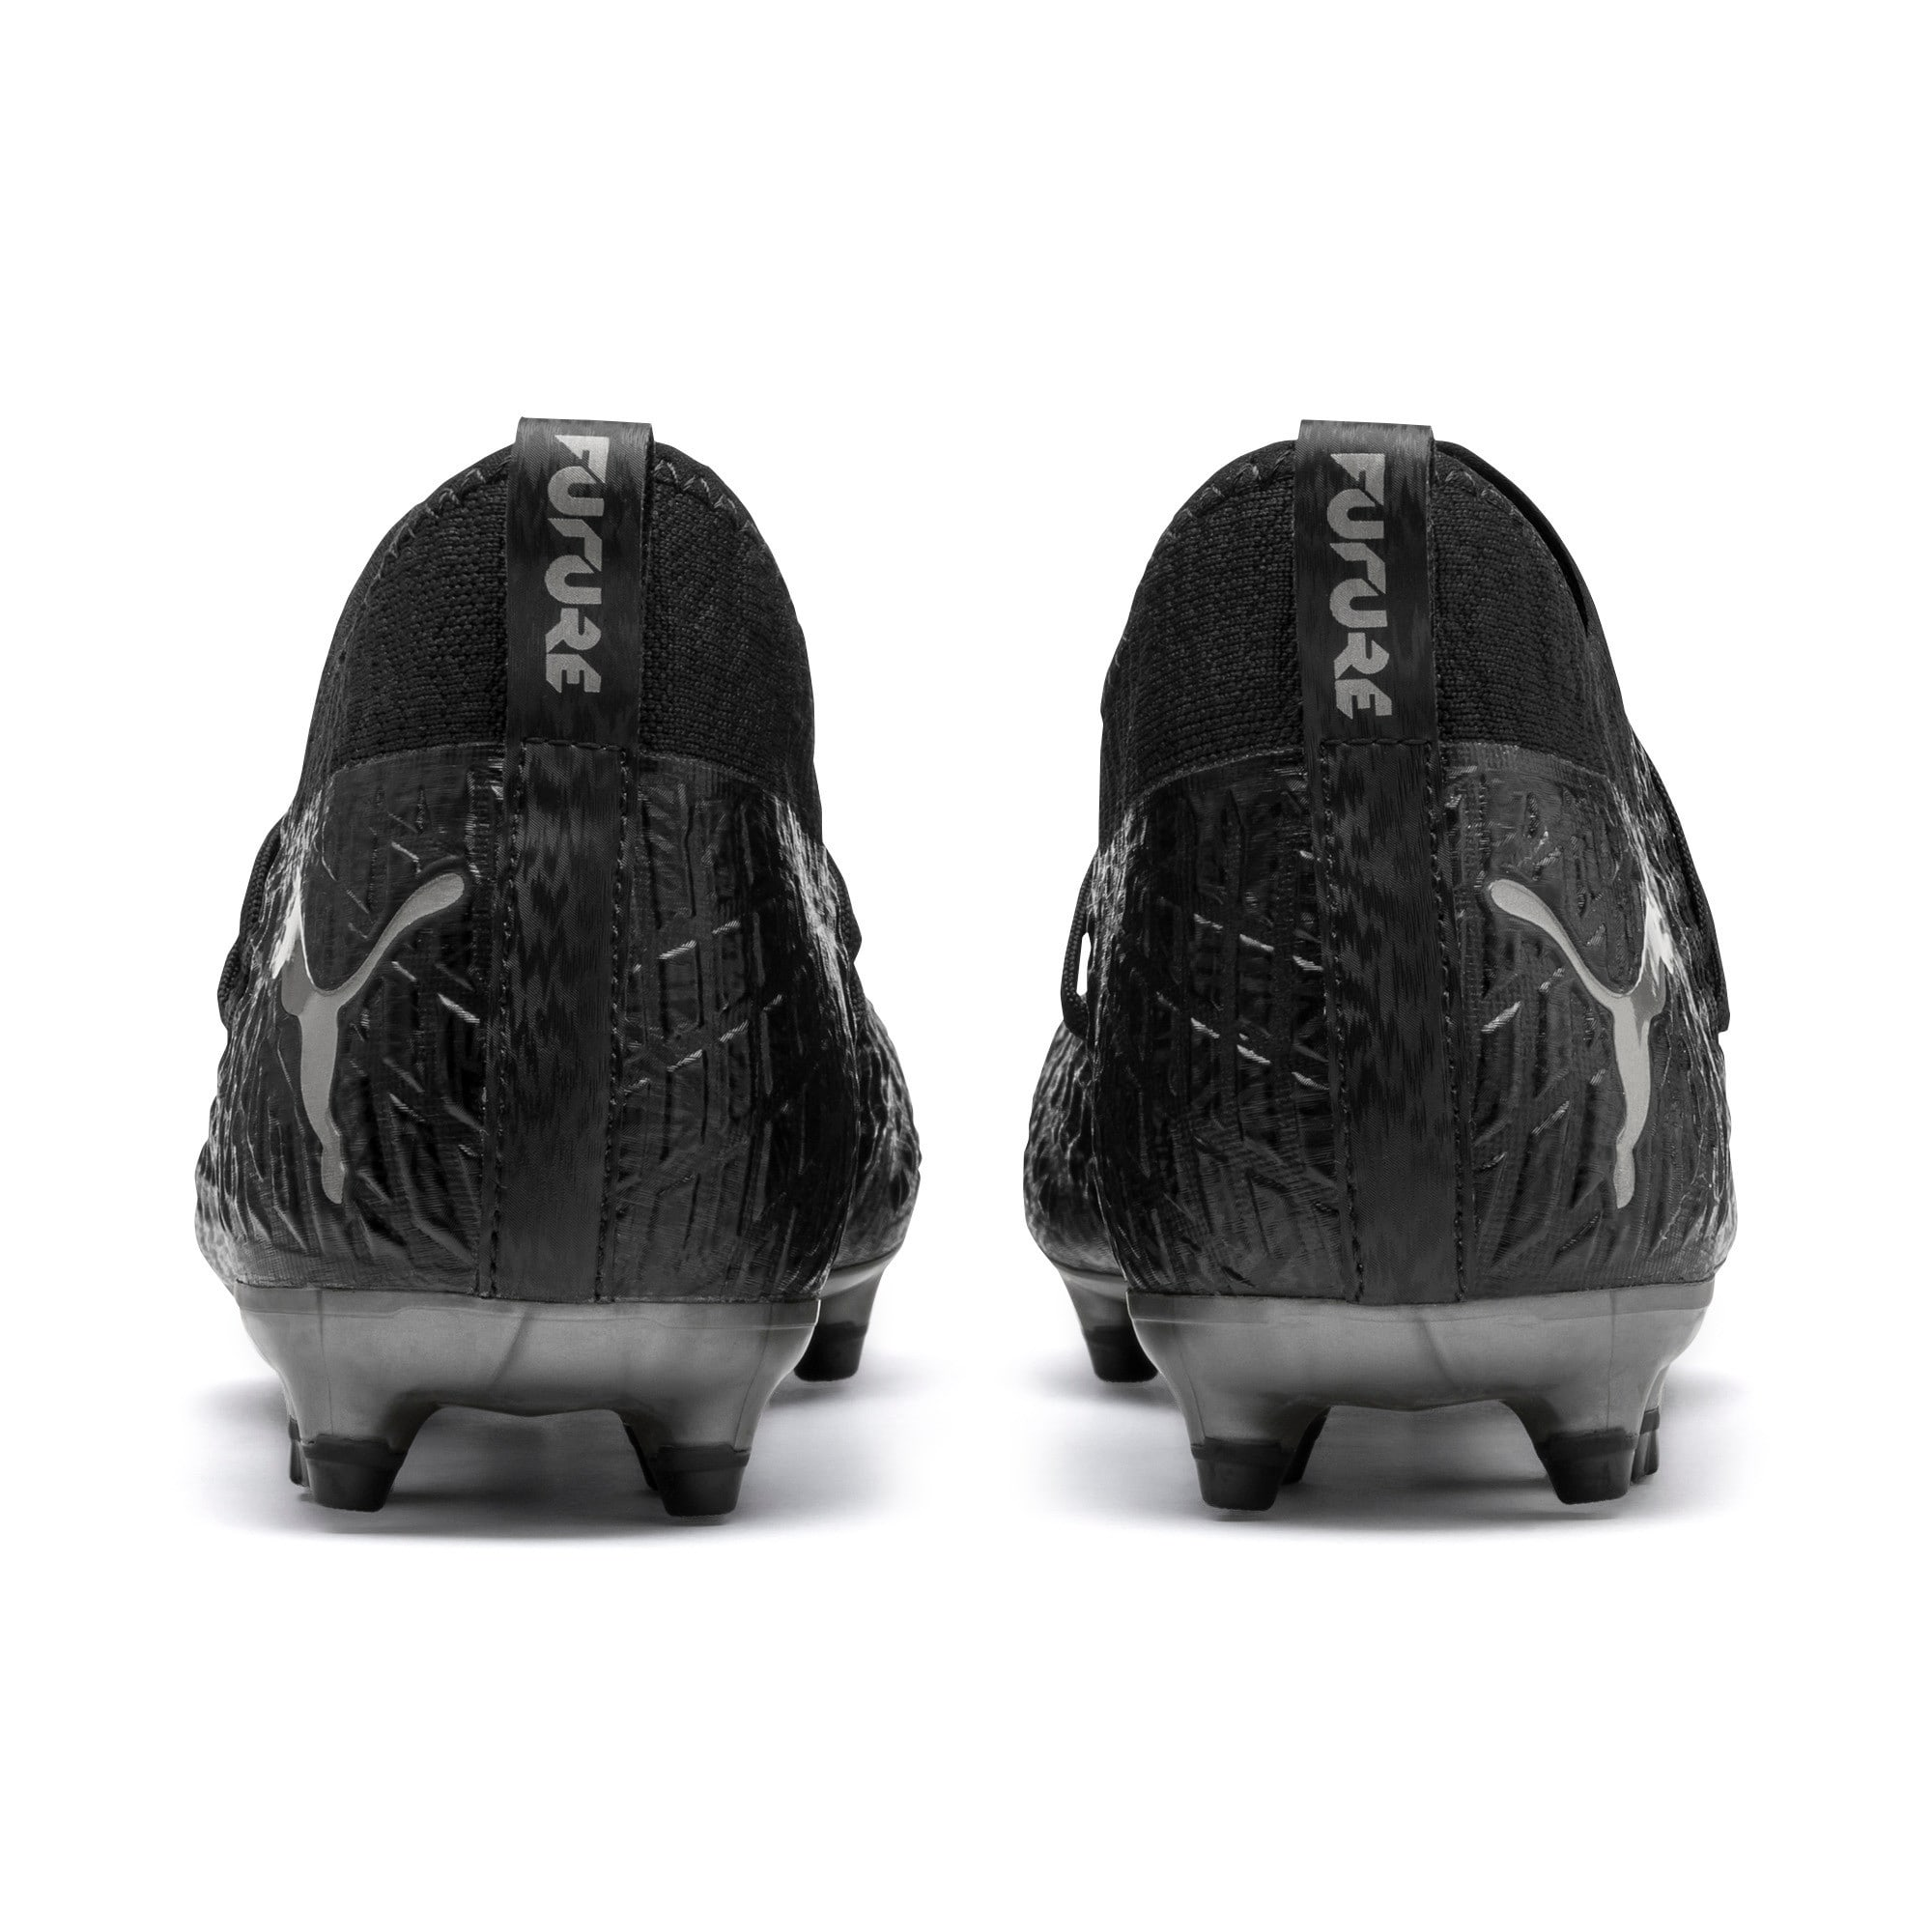 Thumbnail 4 of FUTURE 4.3 NETFIT FG/AG Men's Soccer Cleats, Black-Black-Puma Aged Silver, medium